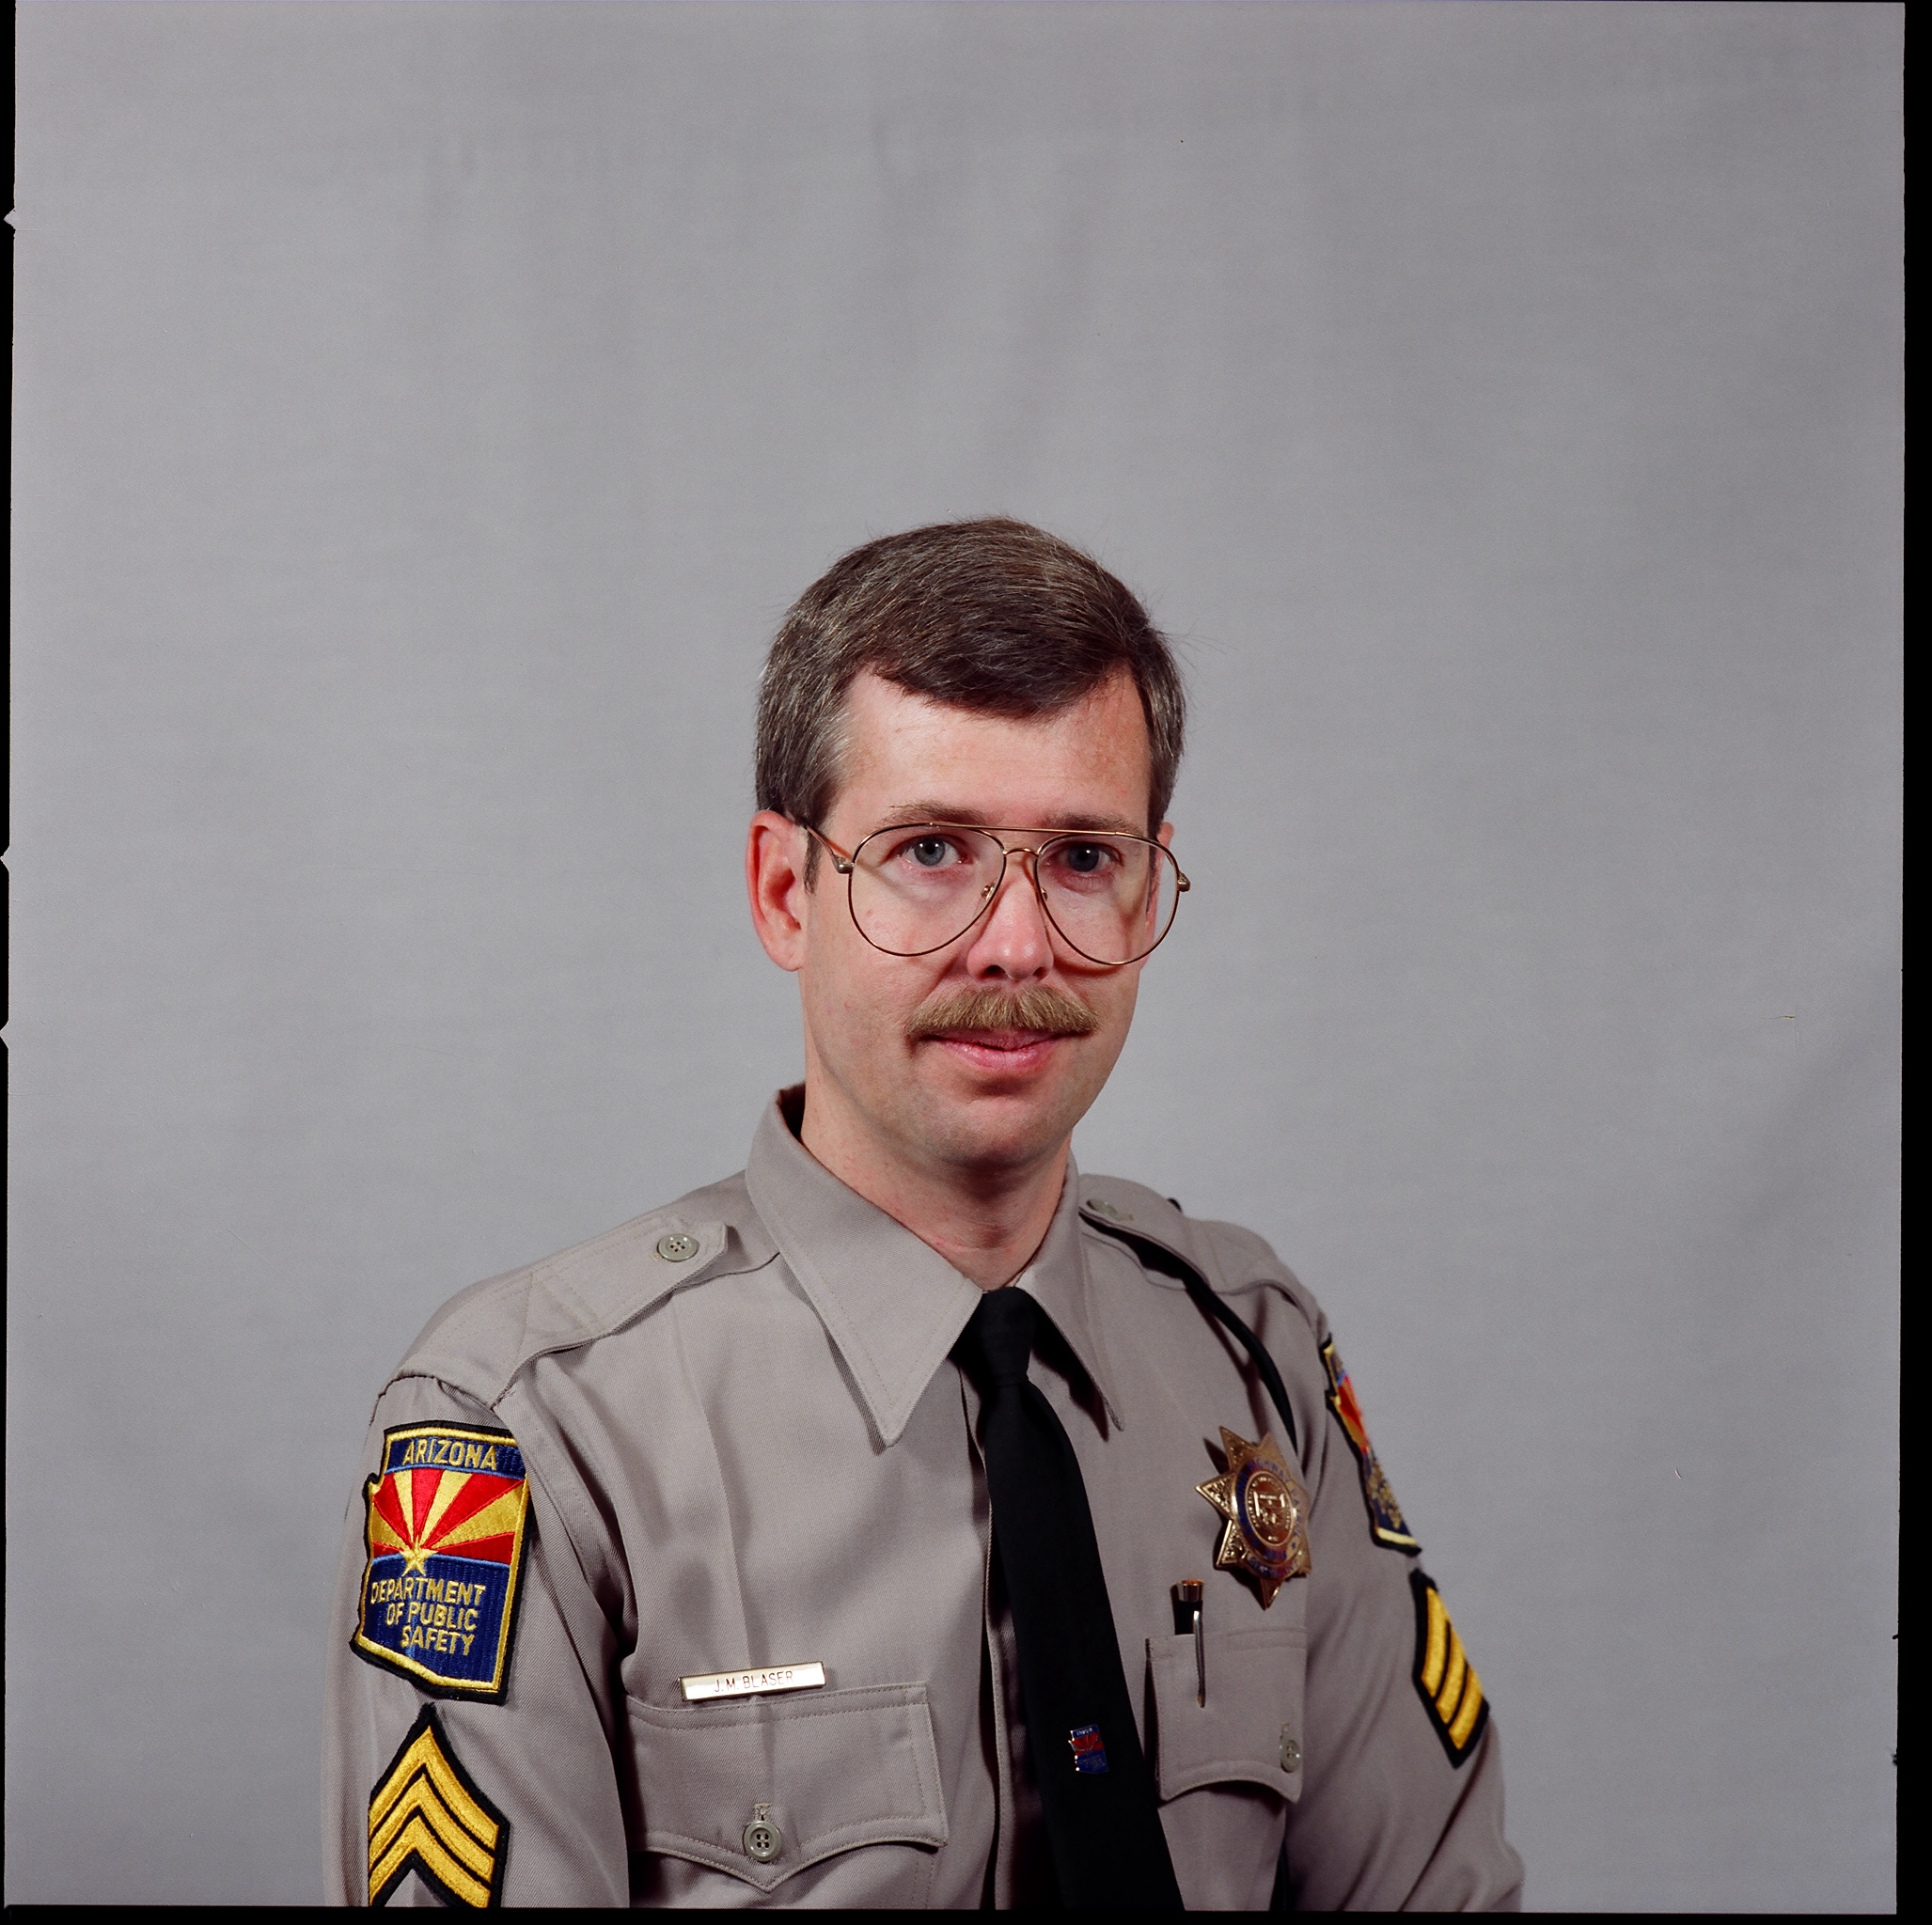 Sgt. John M. Blaser